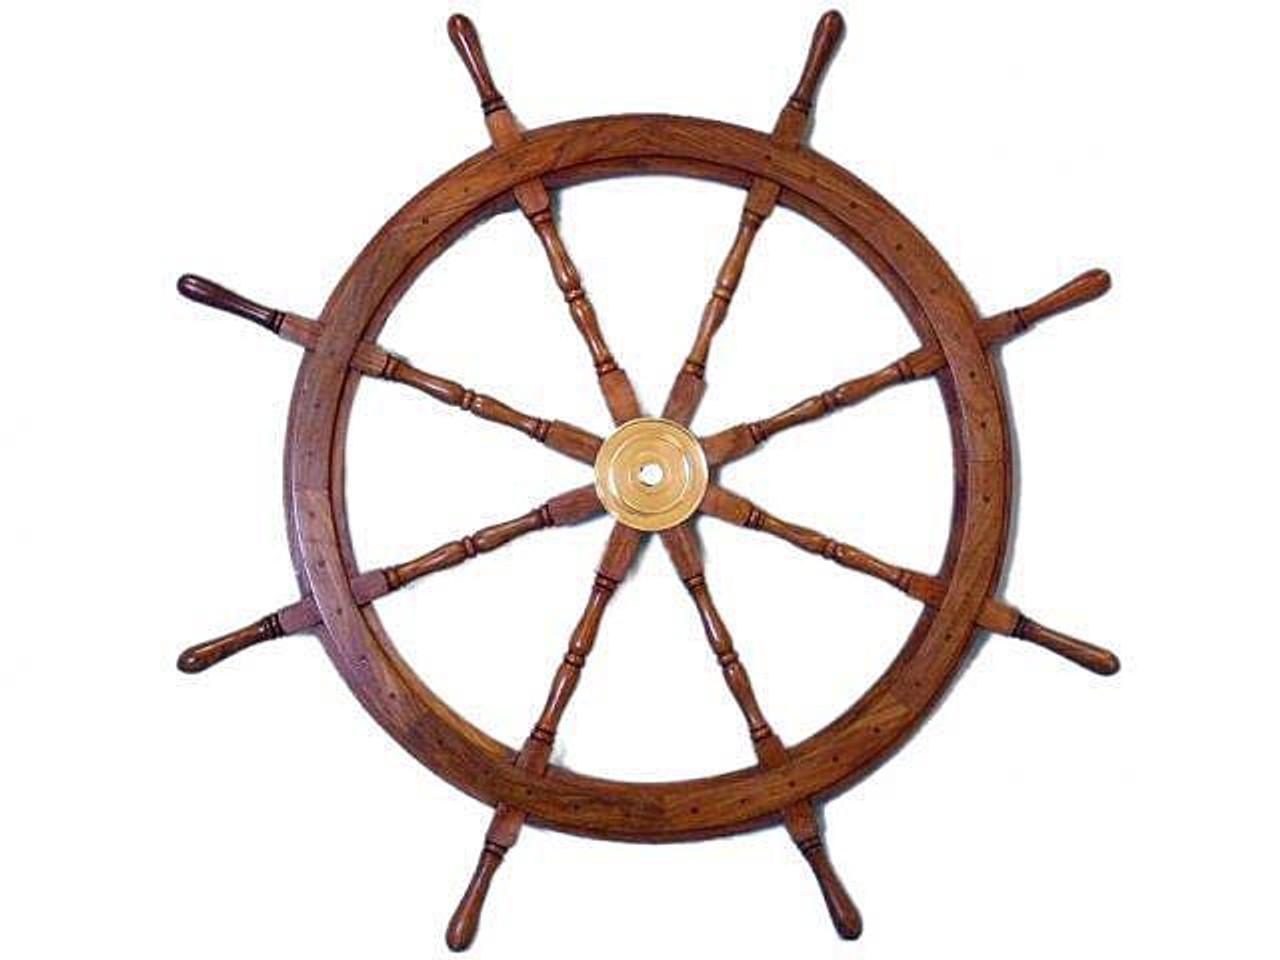 XL Wooden Teak Boat Ships Wheel Brass Center